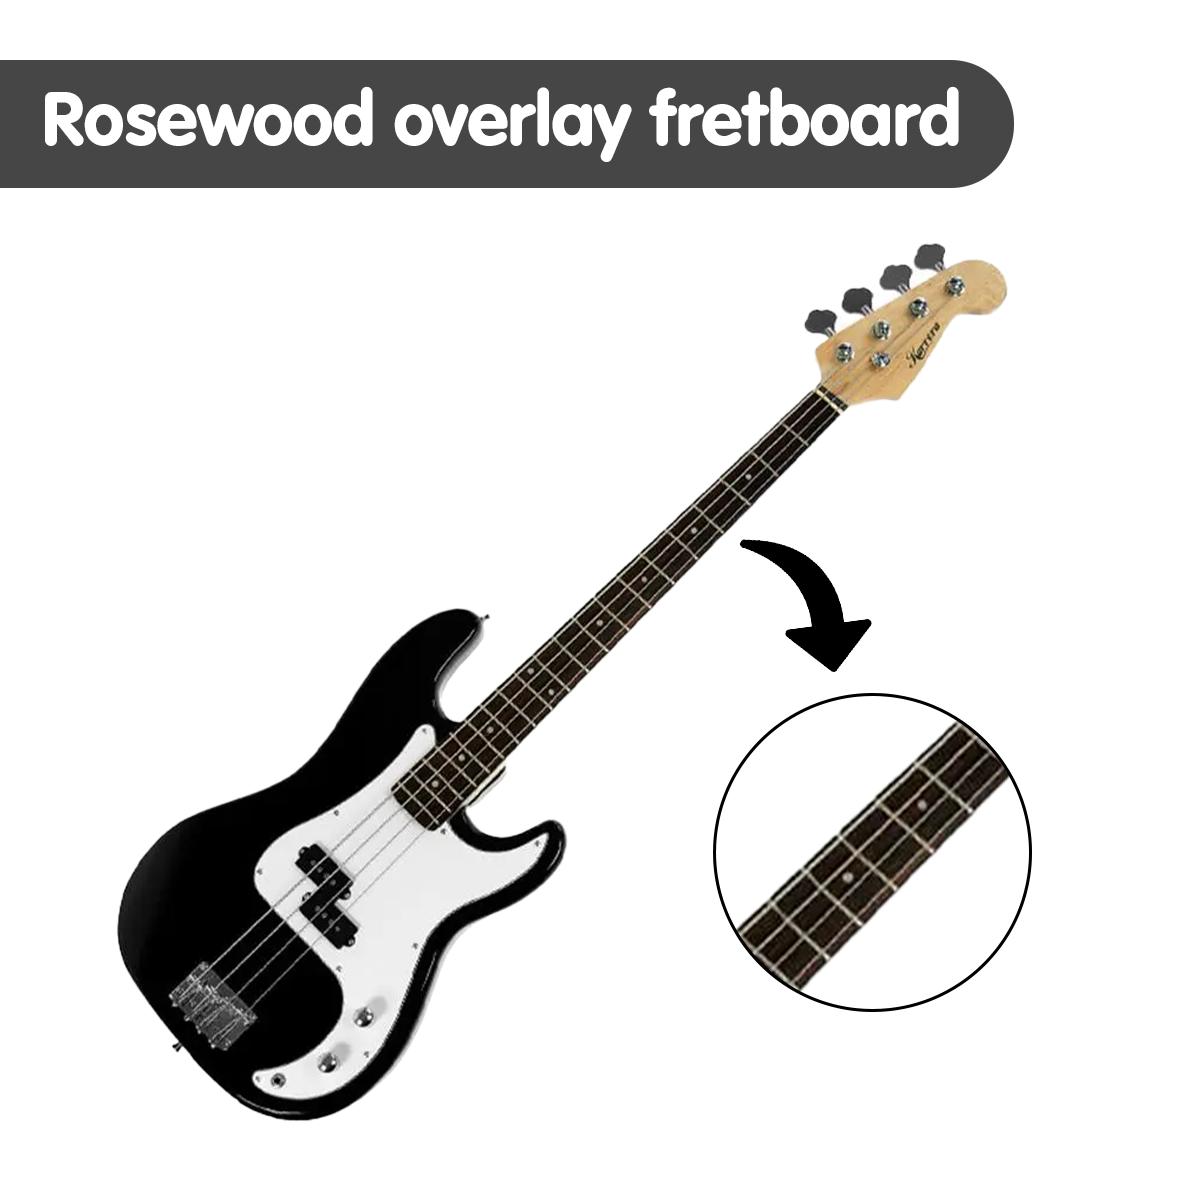 karrera electric bass guitar electronic tuner stand strap bag amp lead black buy guitars. Black Bedroom Furniture Sets. Home Design Ideas